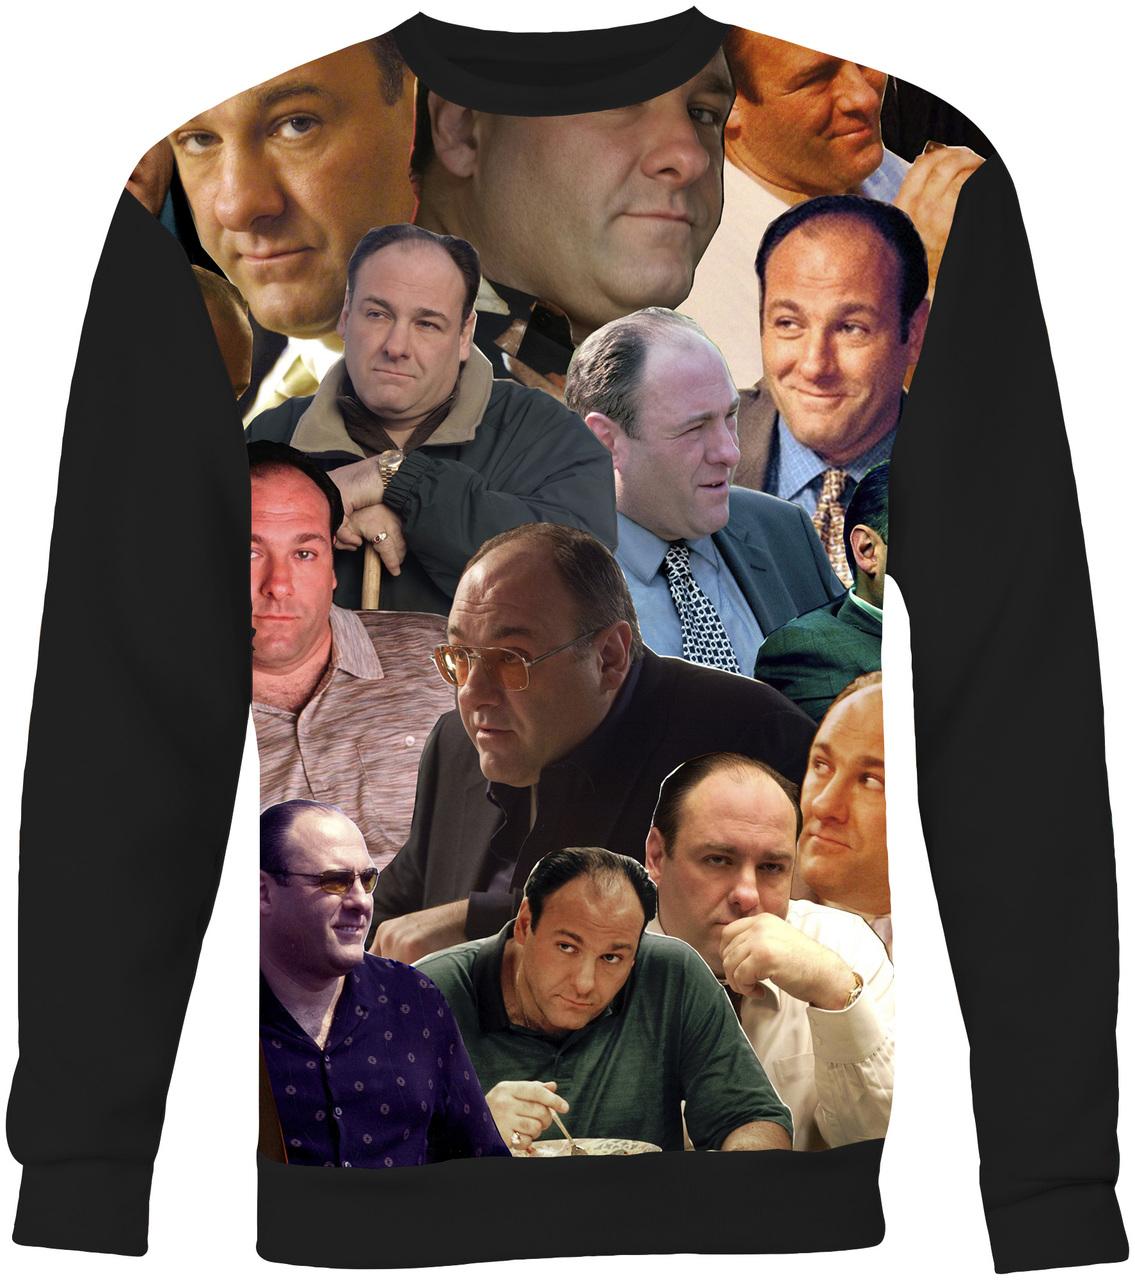 Tony Soprano The Sopranos Collage Sweater Sweatshirt Subliworks